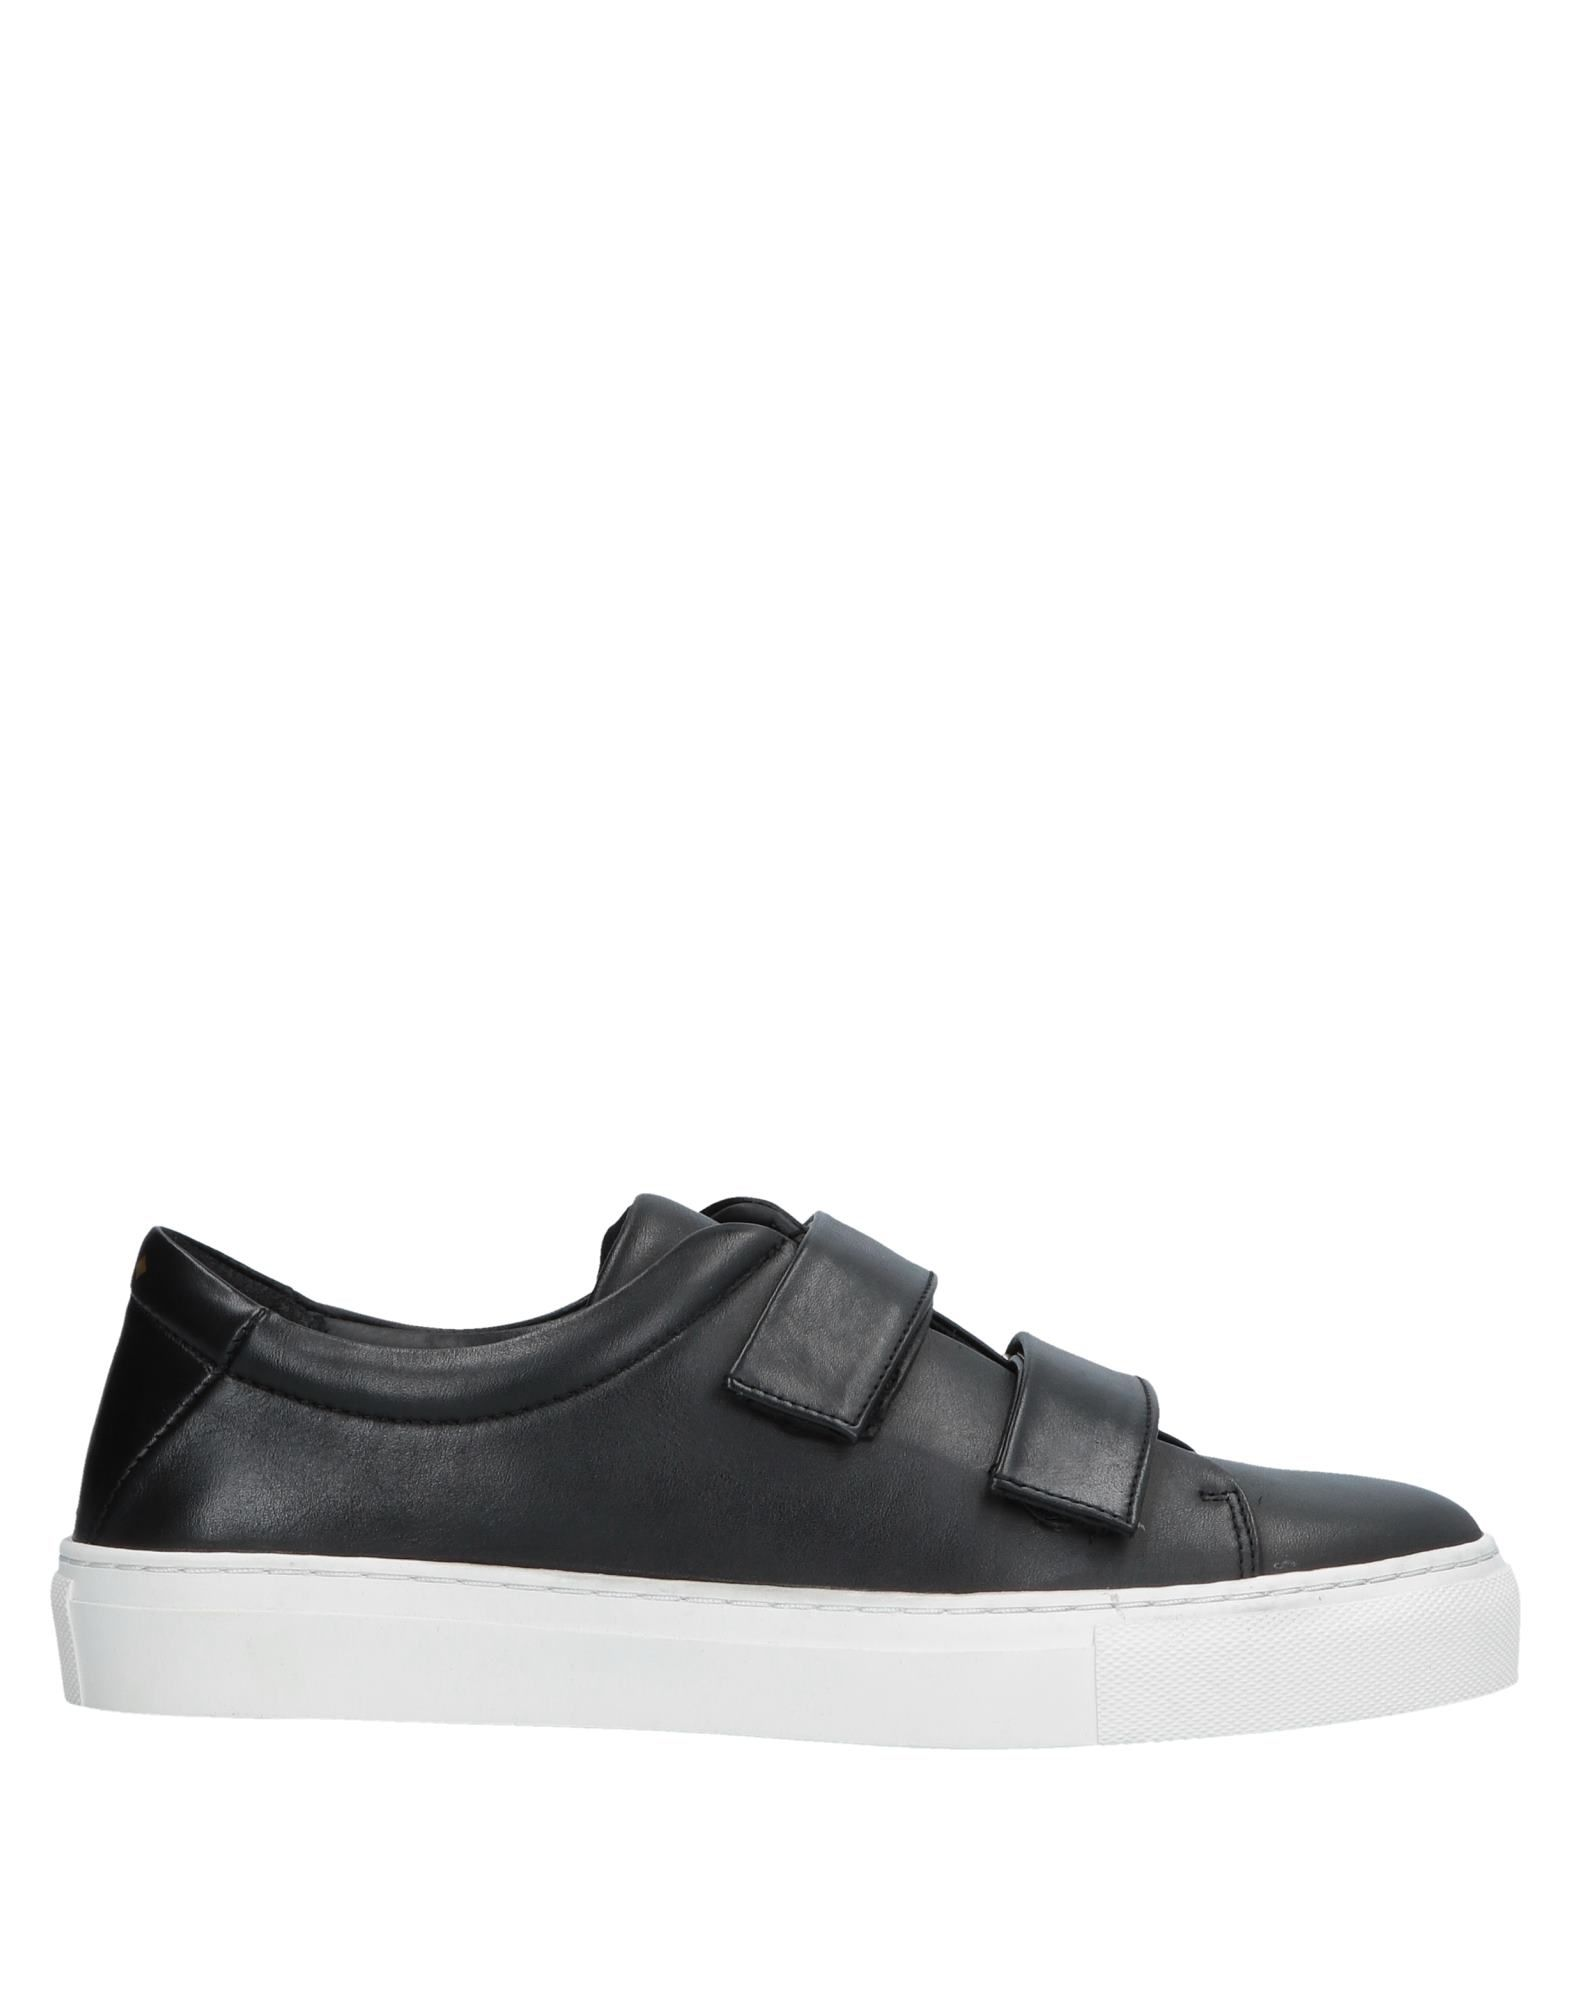 Royal Republiq Sneakers - Women Royal Republiq Sneakers online - on  United Kingdom - online 11574208LA d882a3